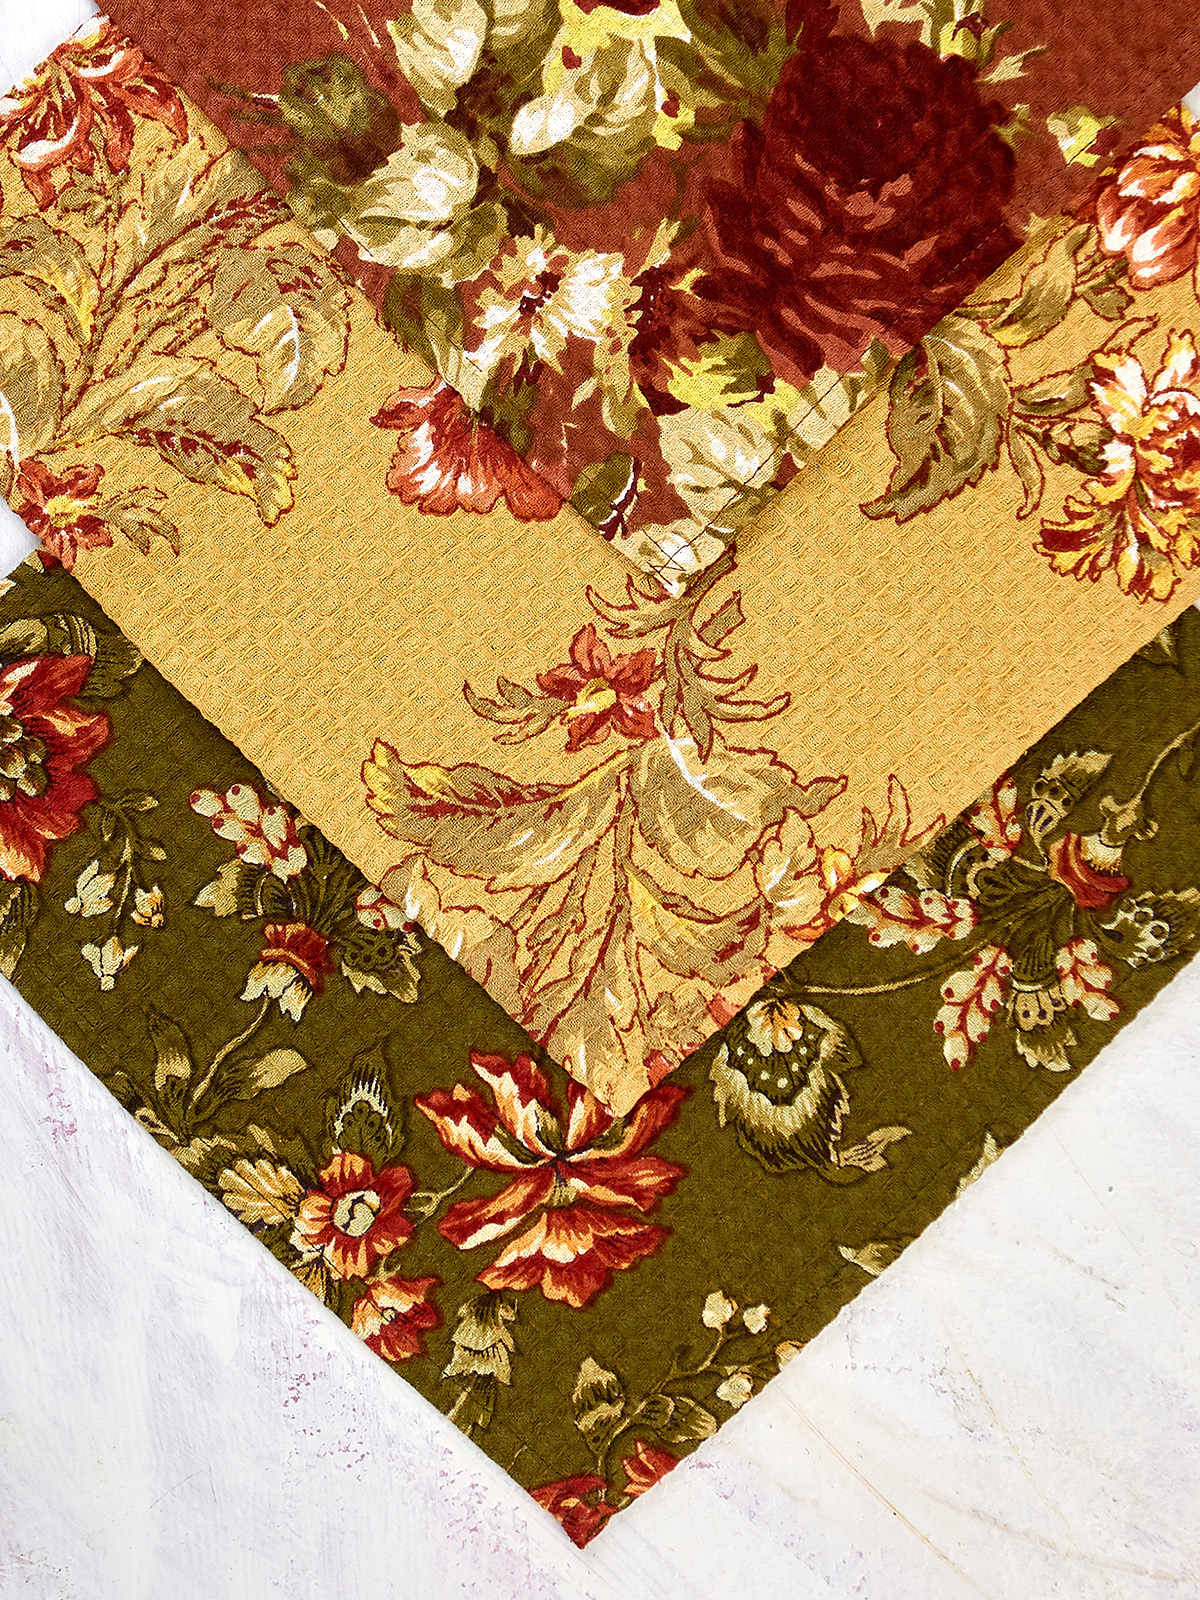 APRIL CORNELL BOUNTIFUL HARVEST TEA TOWELS - SET OF 3-2